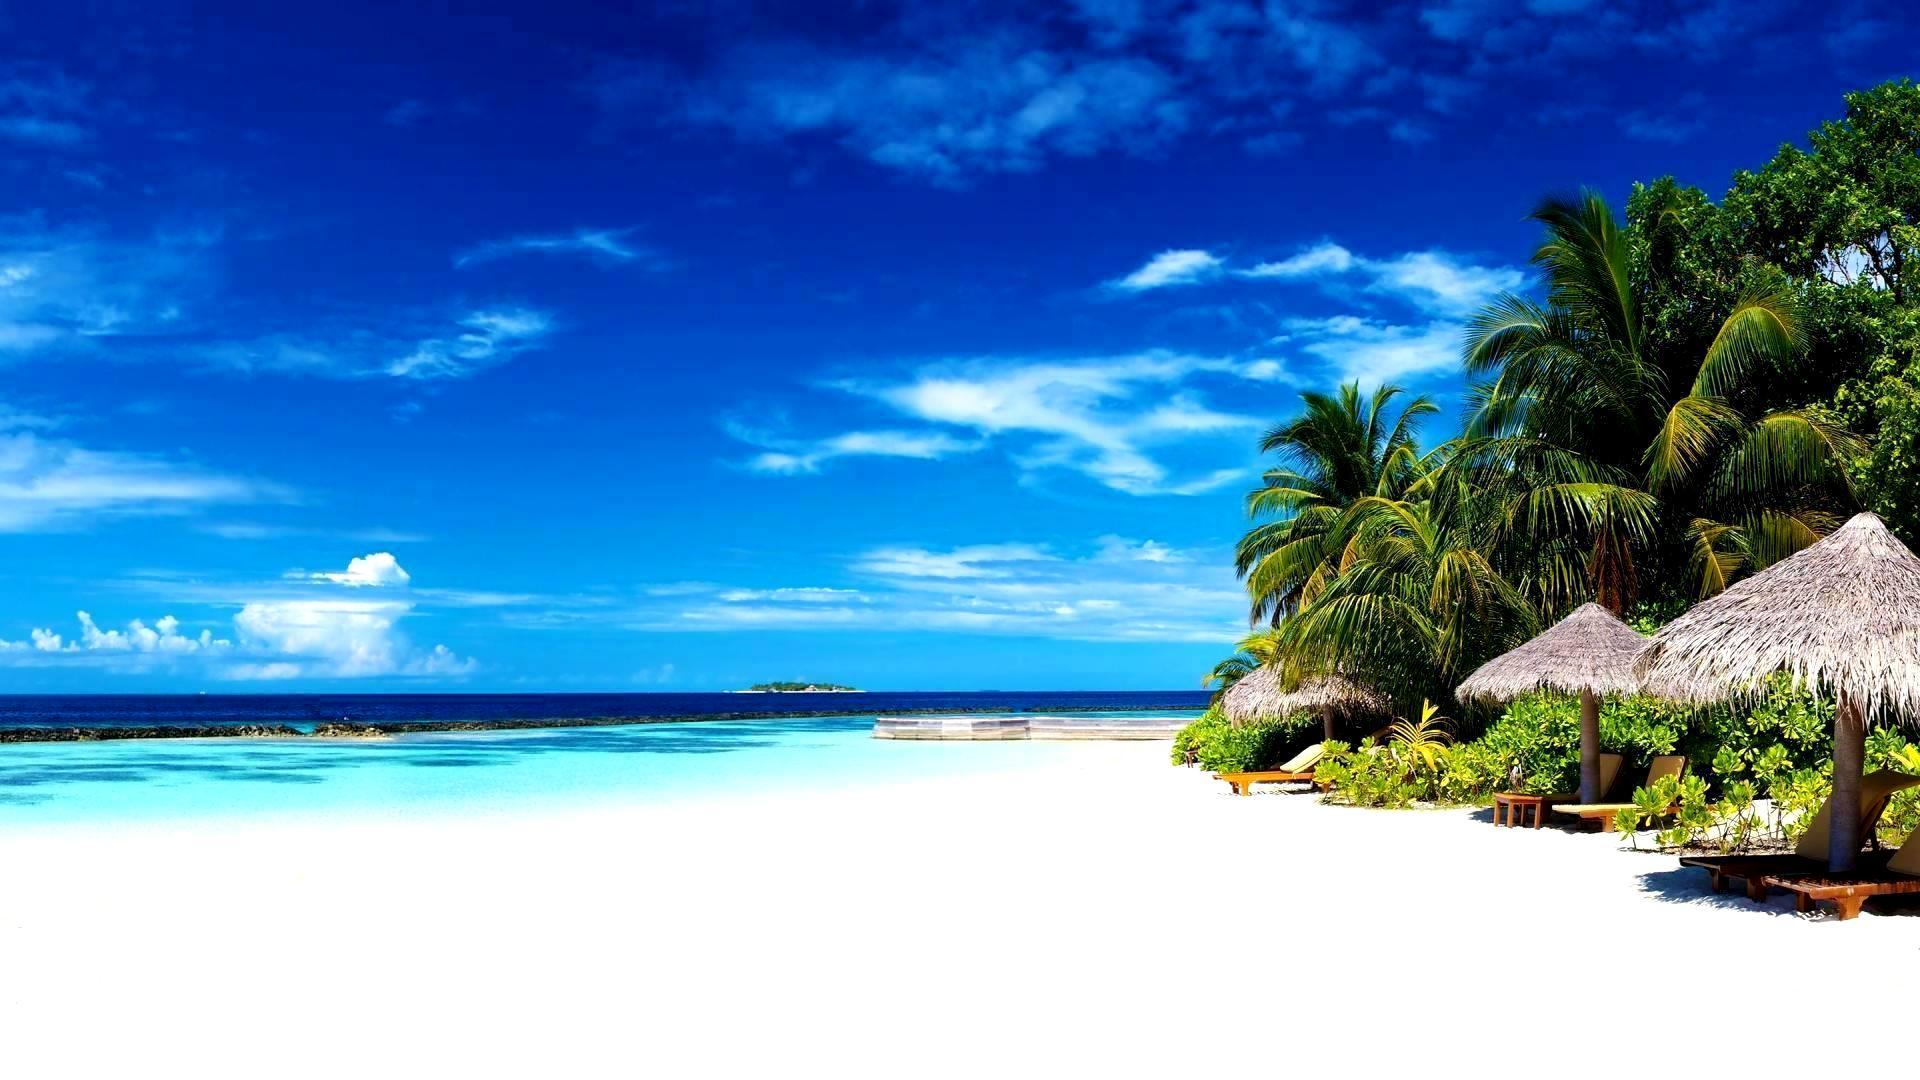 16k Ultra Hd Beach Wallpapers Top Free 16k Ultra Hd Beach